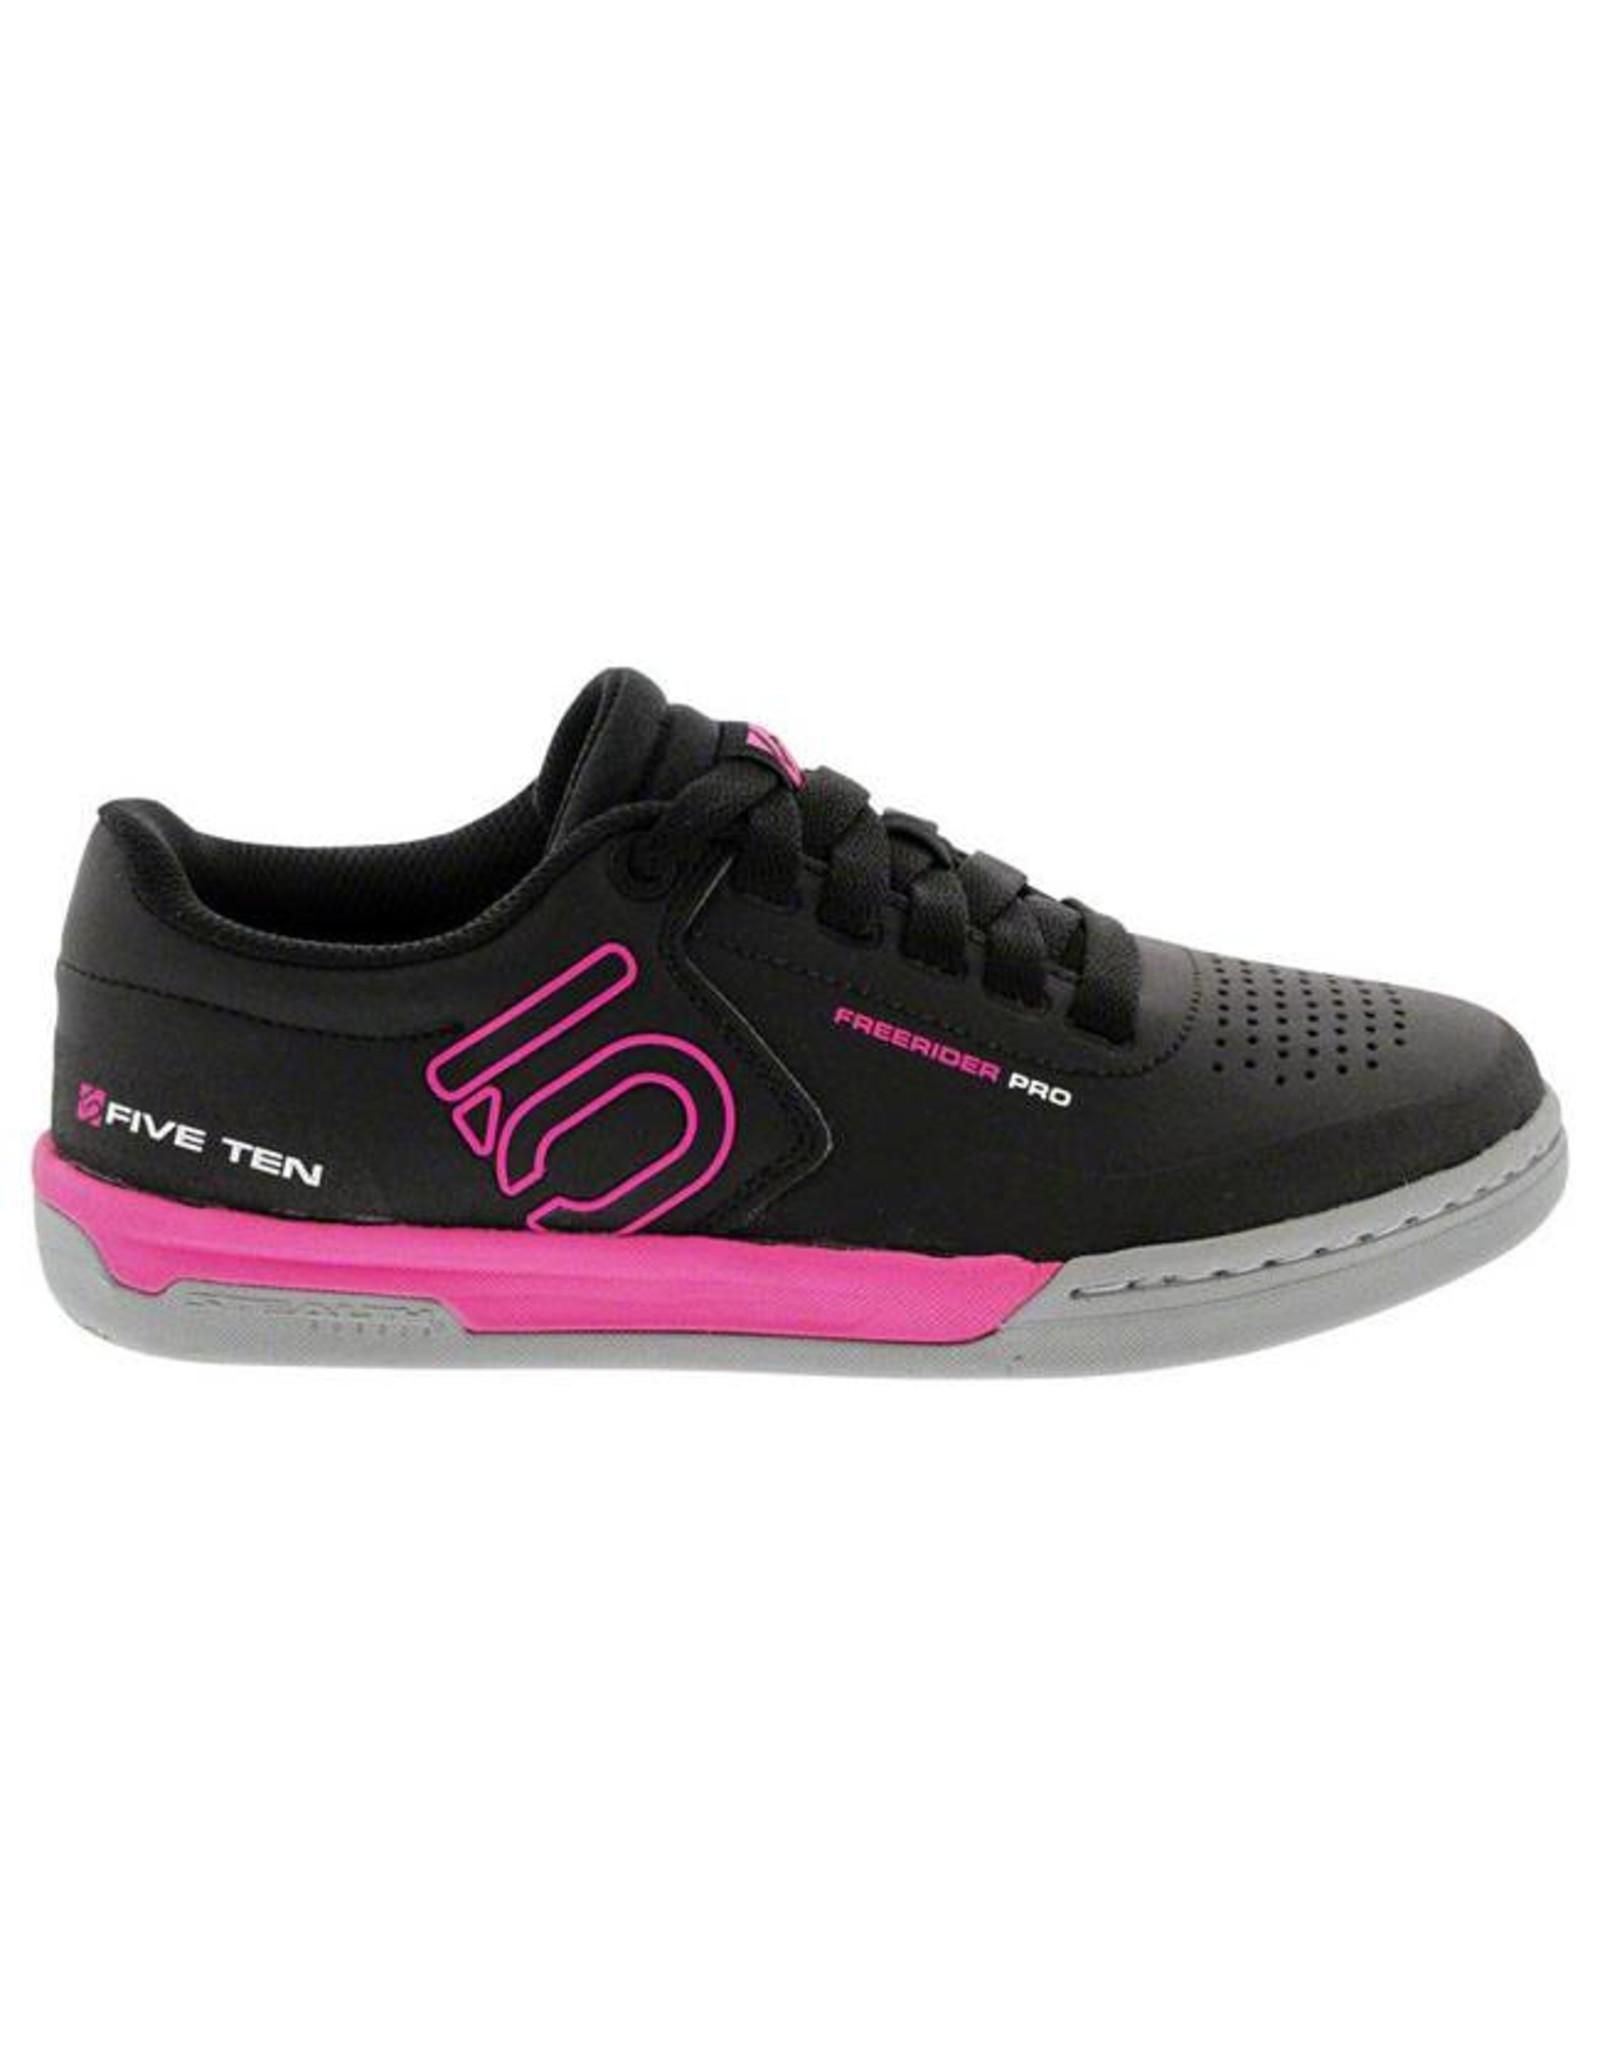 Five Ten Five Ten Freerider Pro Women's Flat Pedal Shoe: Black/Pink 6.5